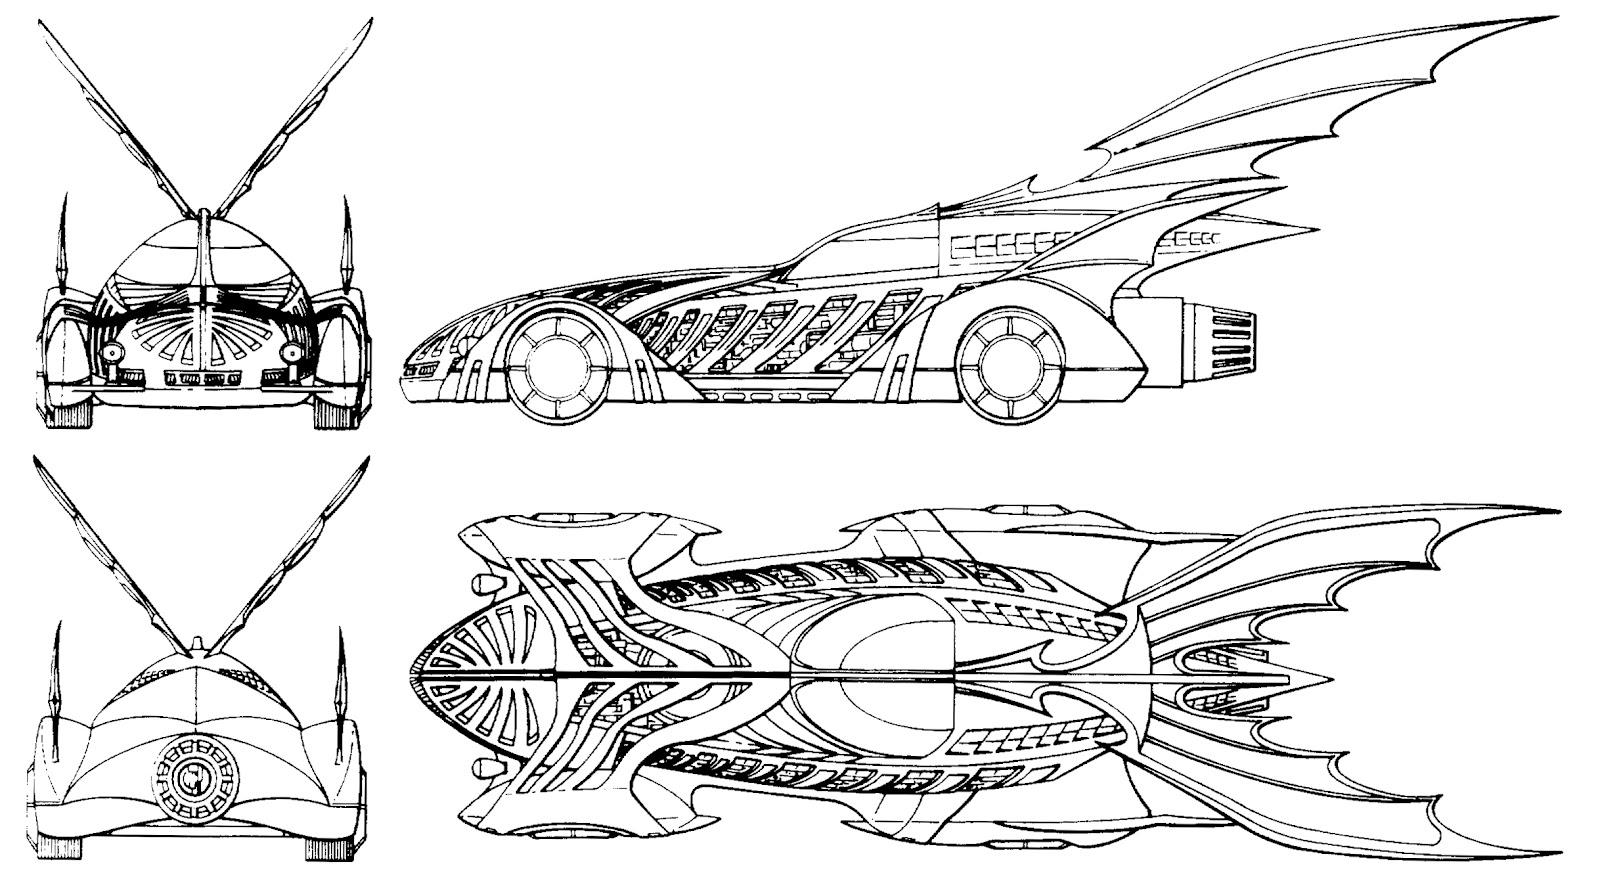 batmobile coloring pages - the dork review rob 39 s room batmobile blueprints